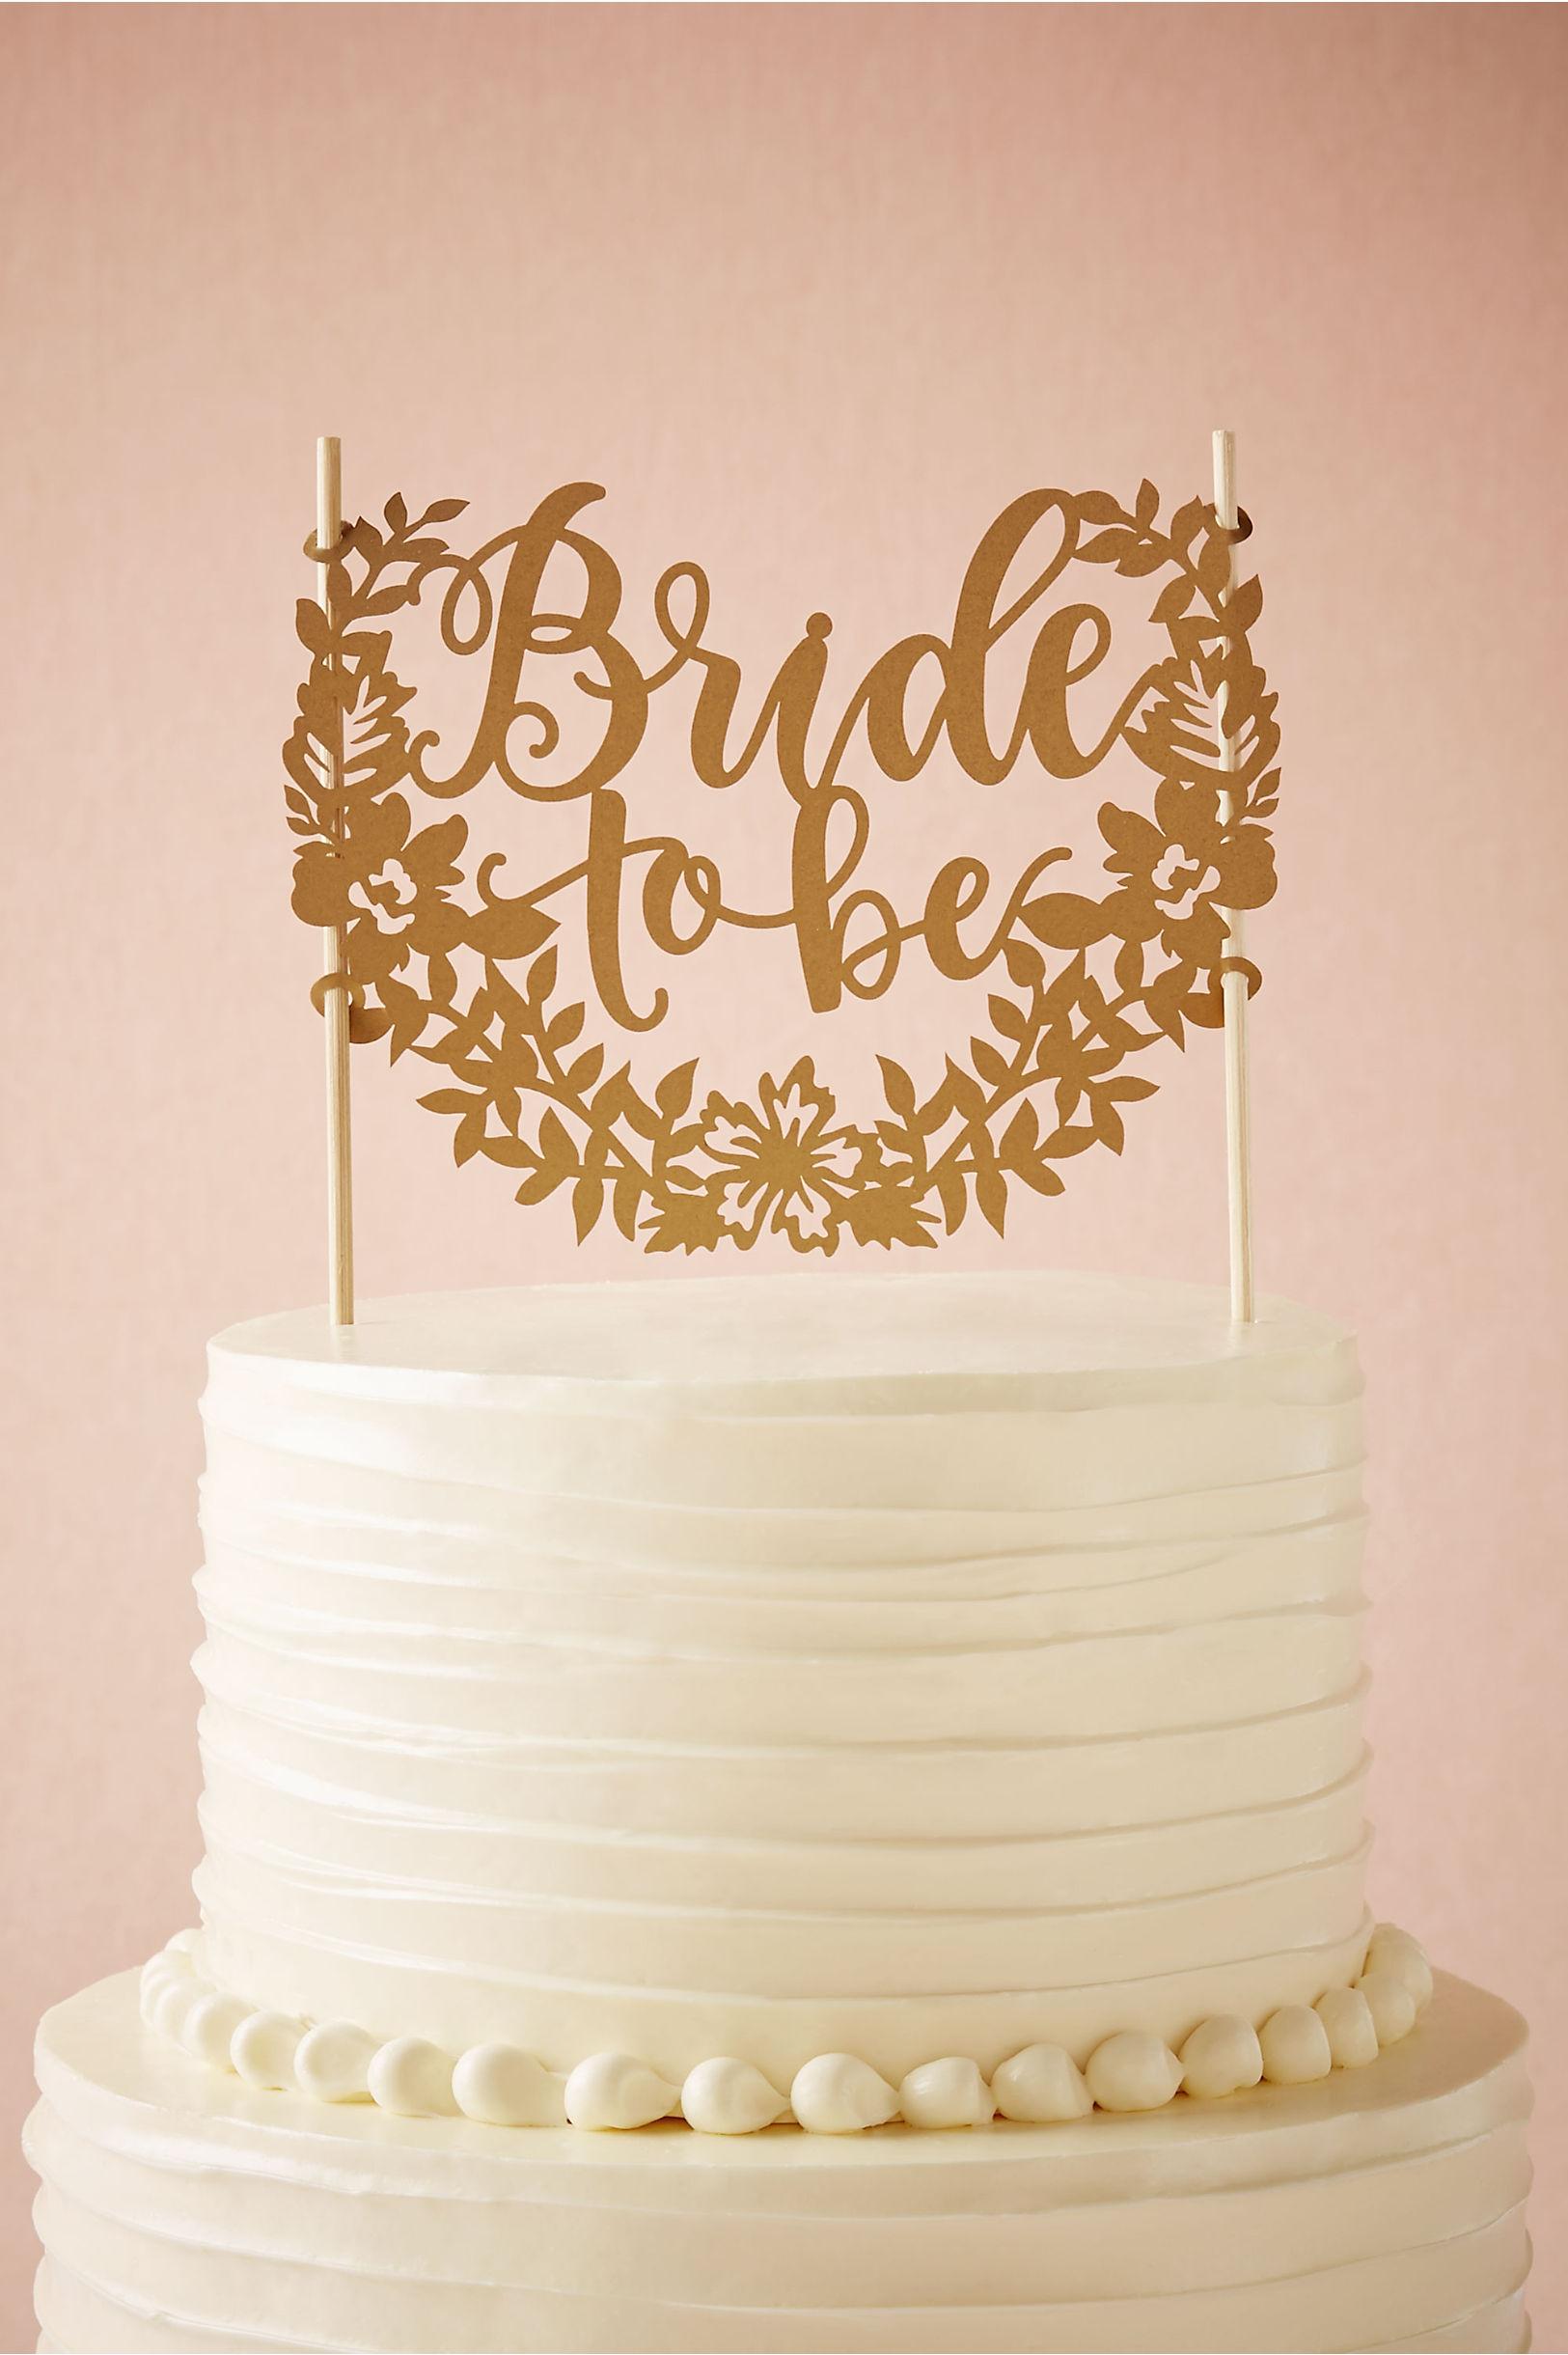 gold bride to be cake topper bhldn - Cake Decor